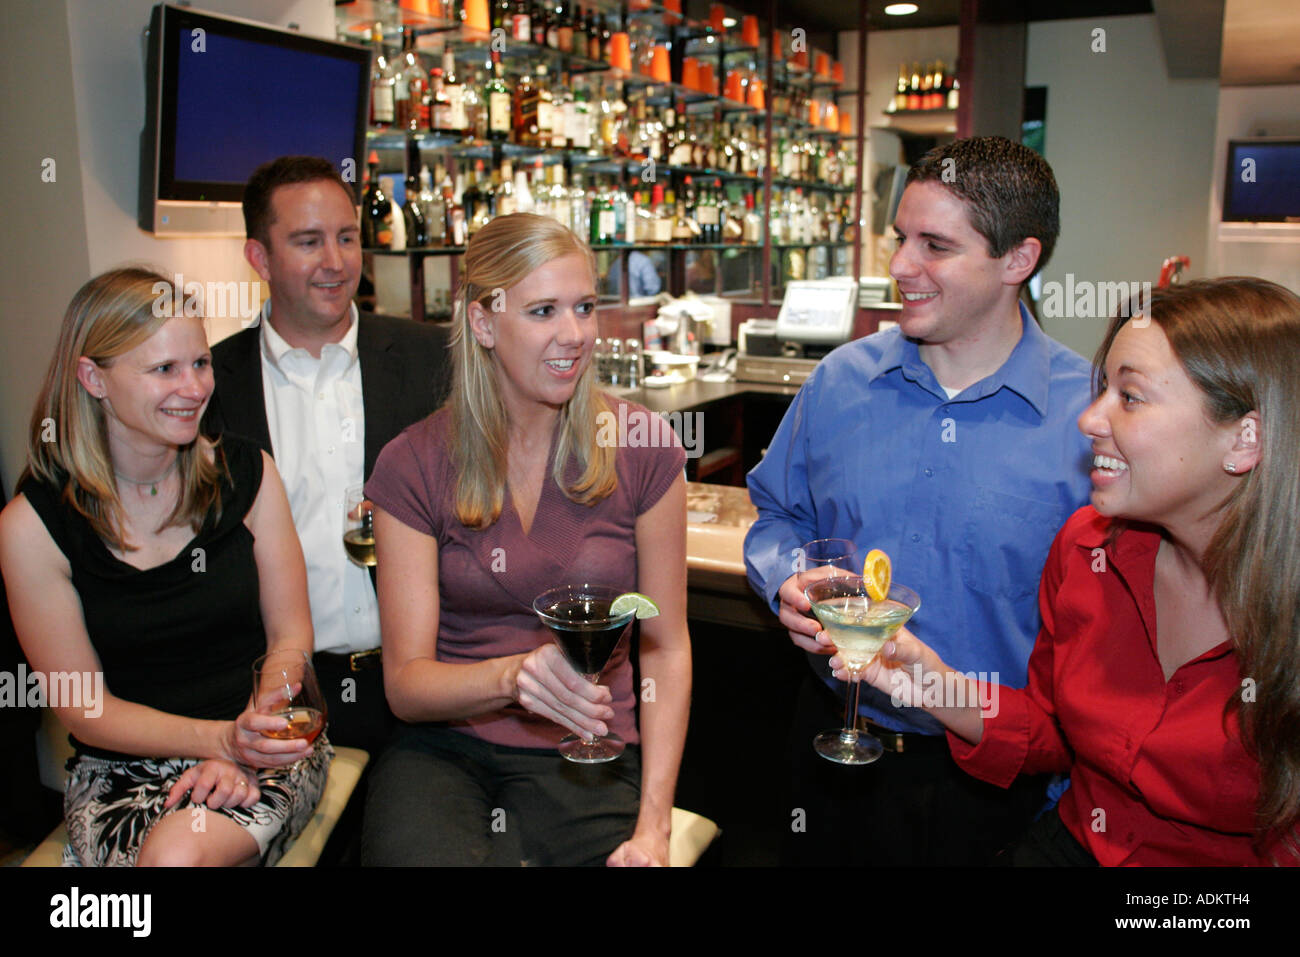 Norfolk Virginia Dominion Tower Vintage Kitchen bar alcohol drinks men  women socializing networking